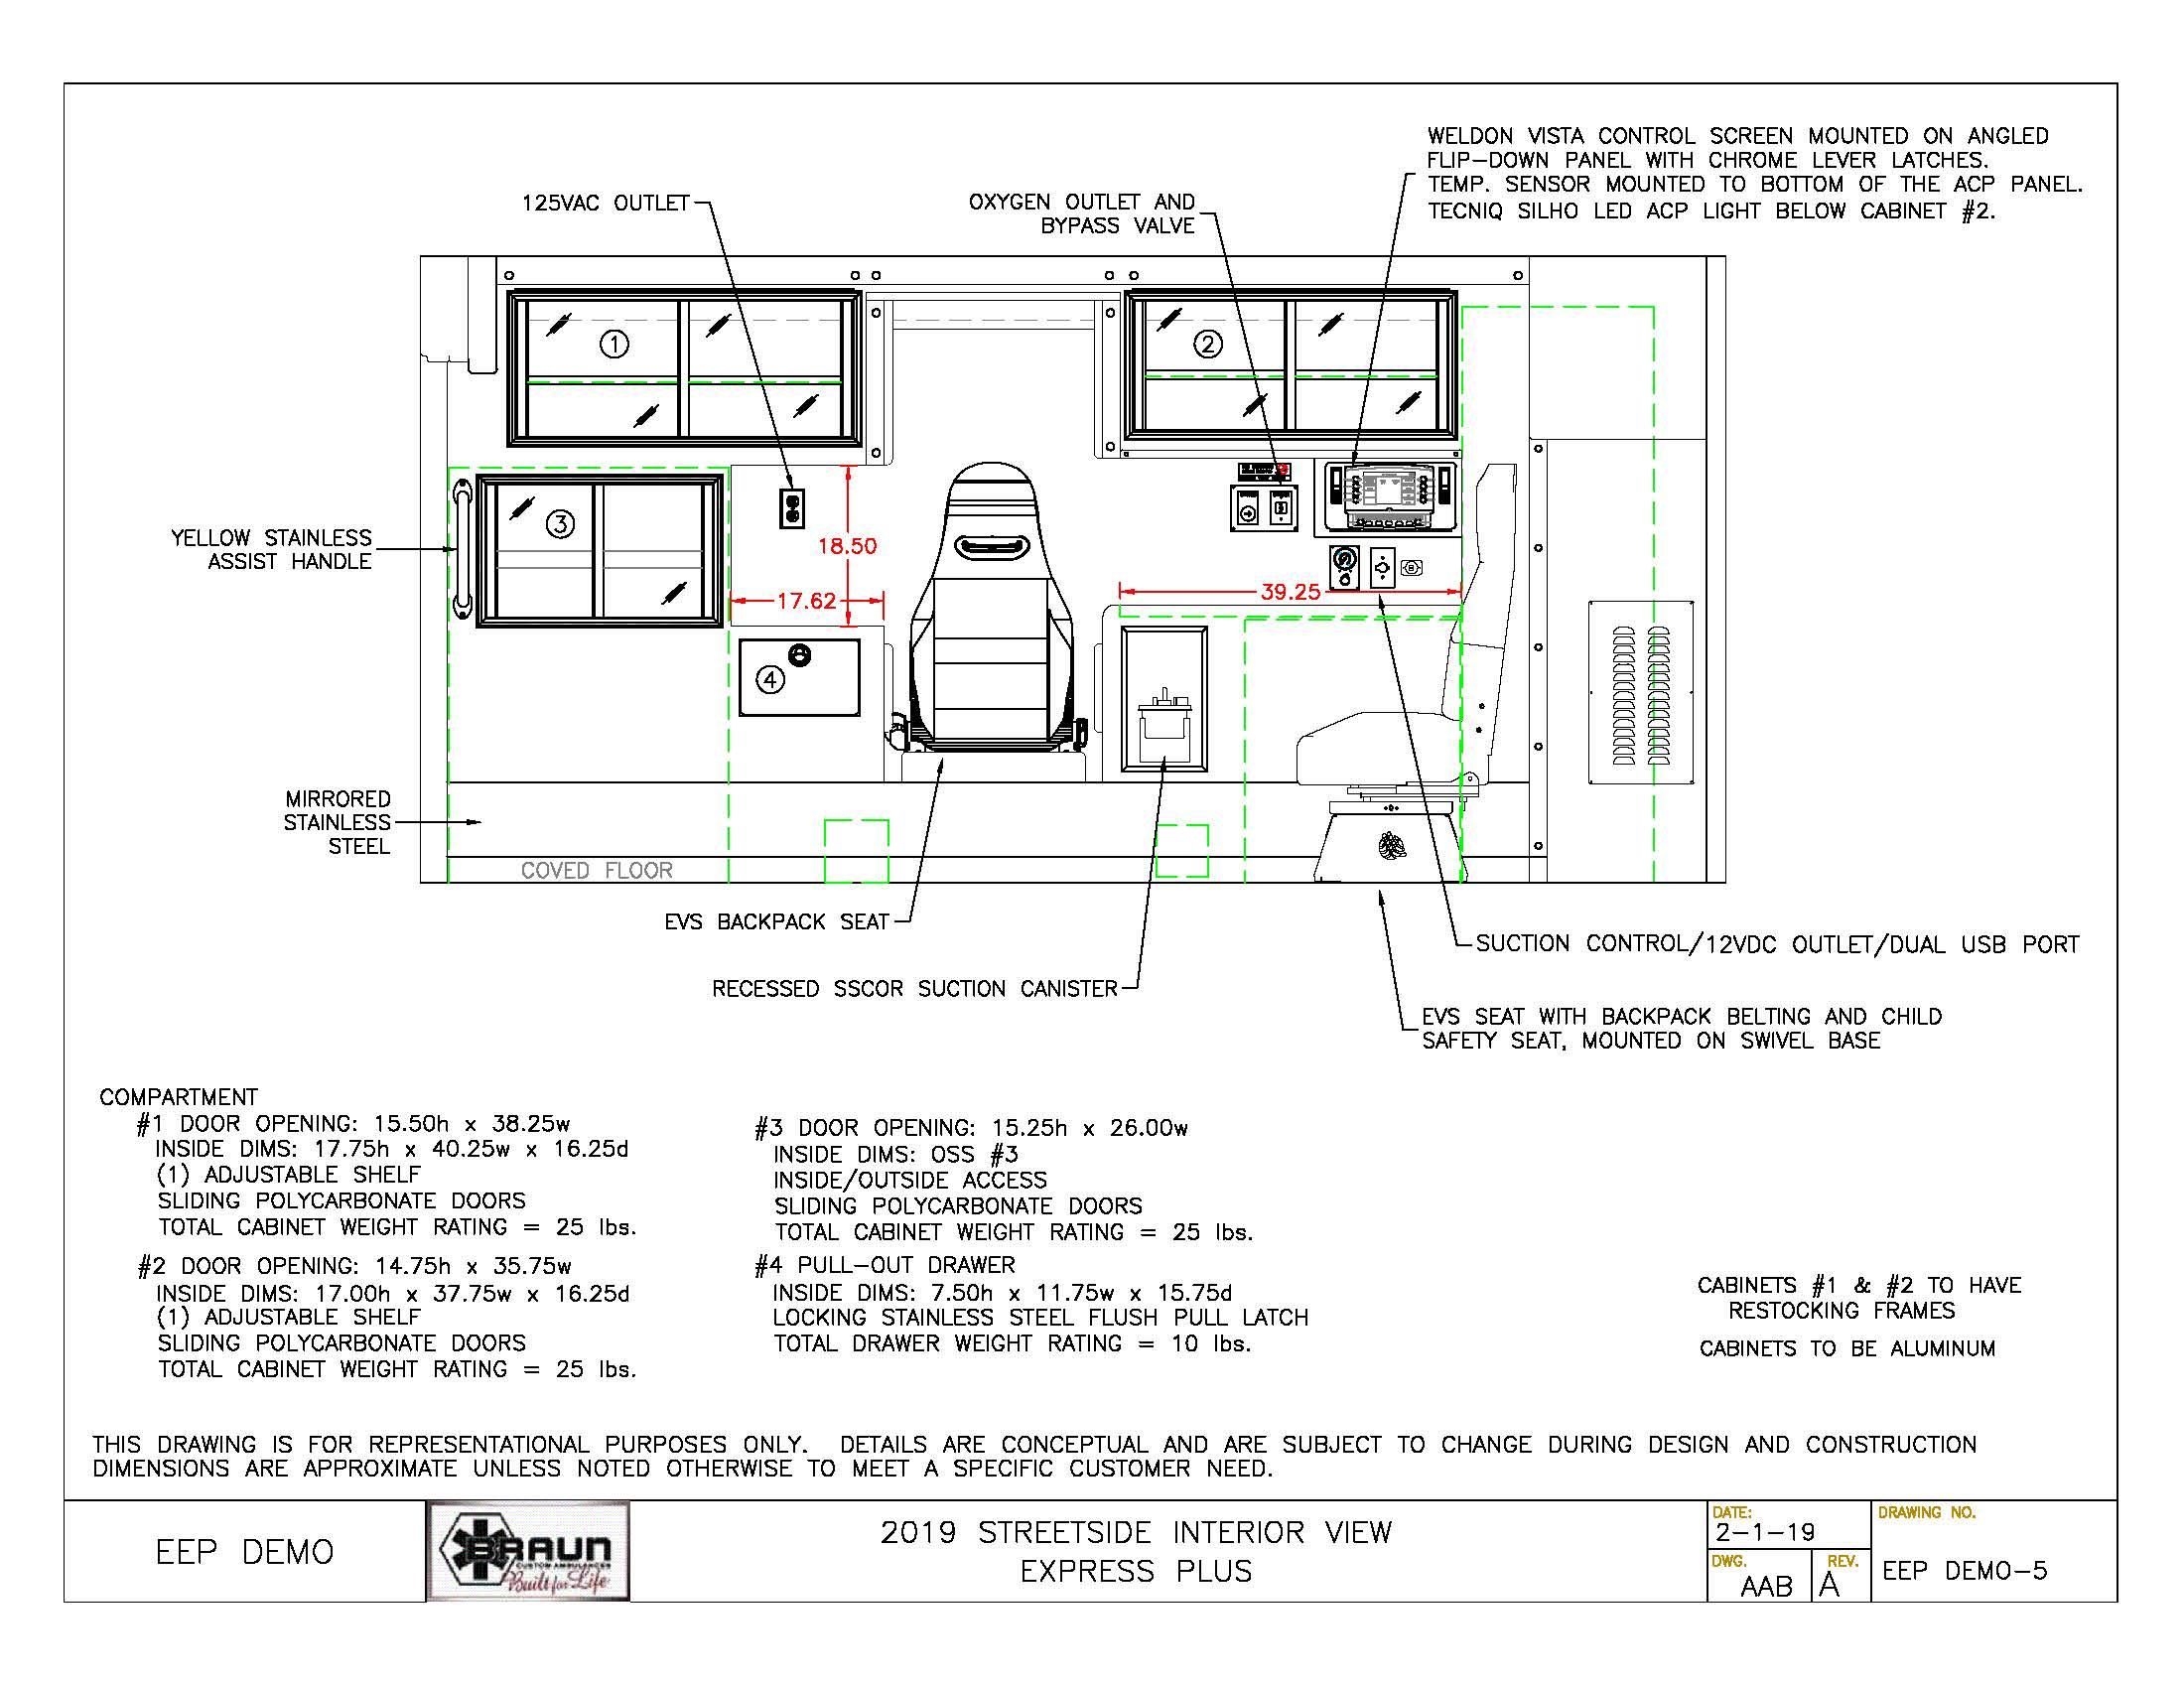 BRAUN - EEP STOCK UNIT - Express + Demo 2-1-19_Page_5